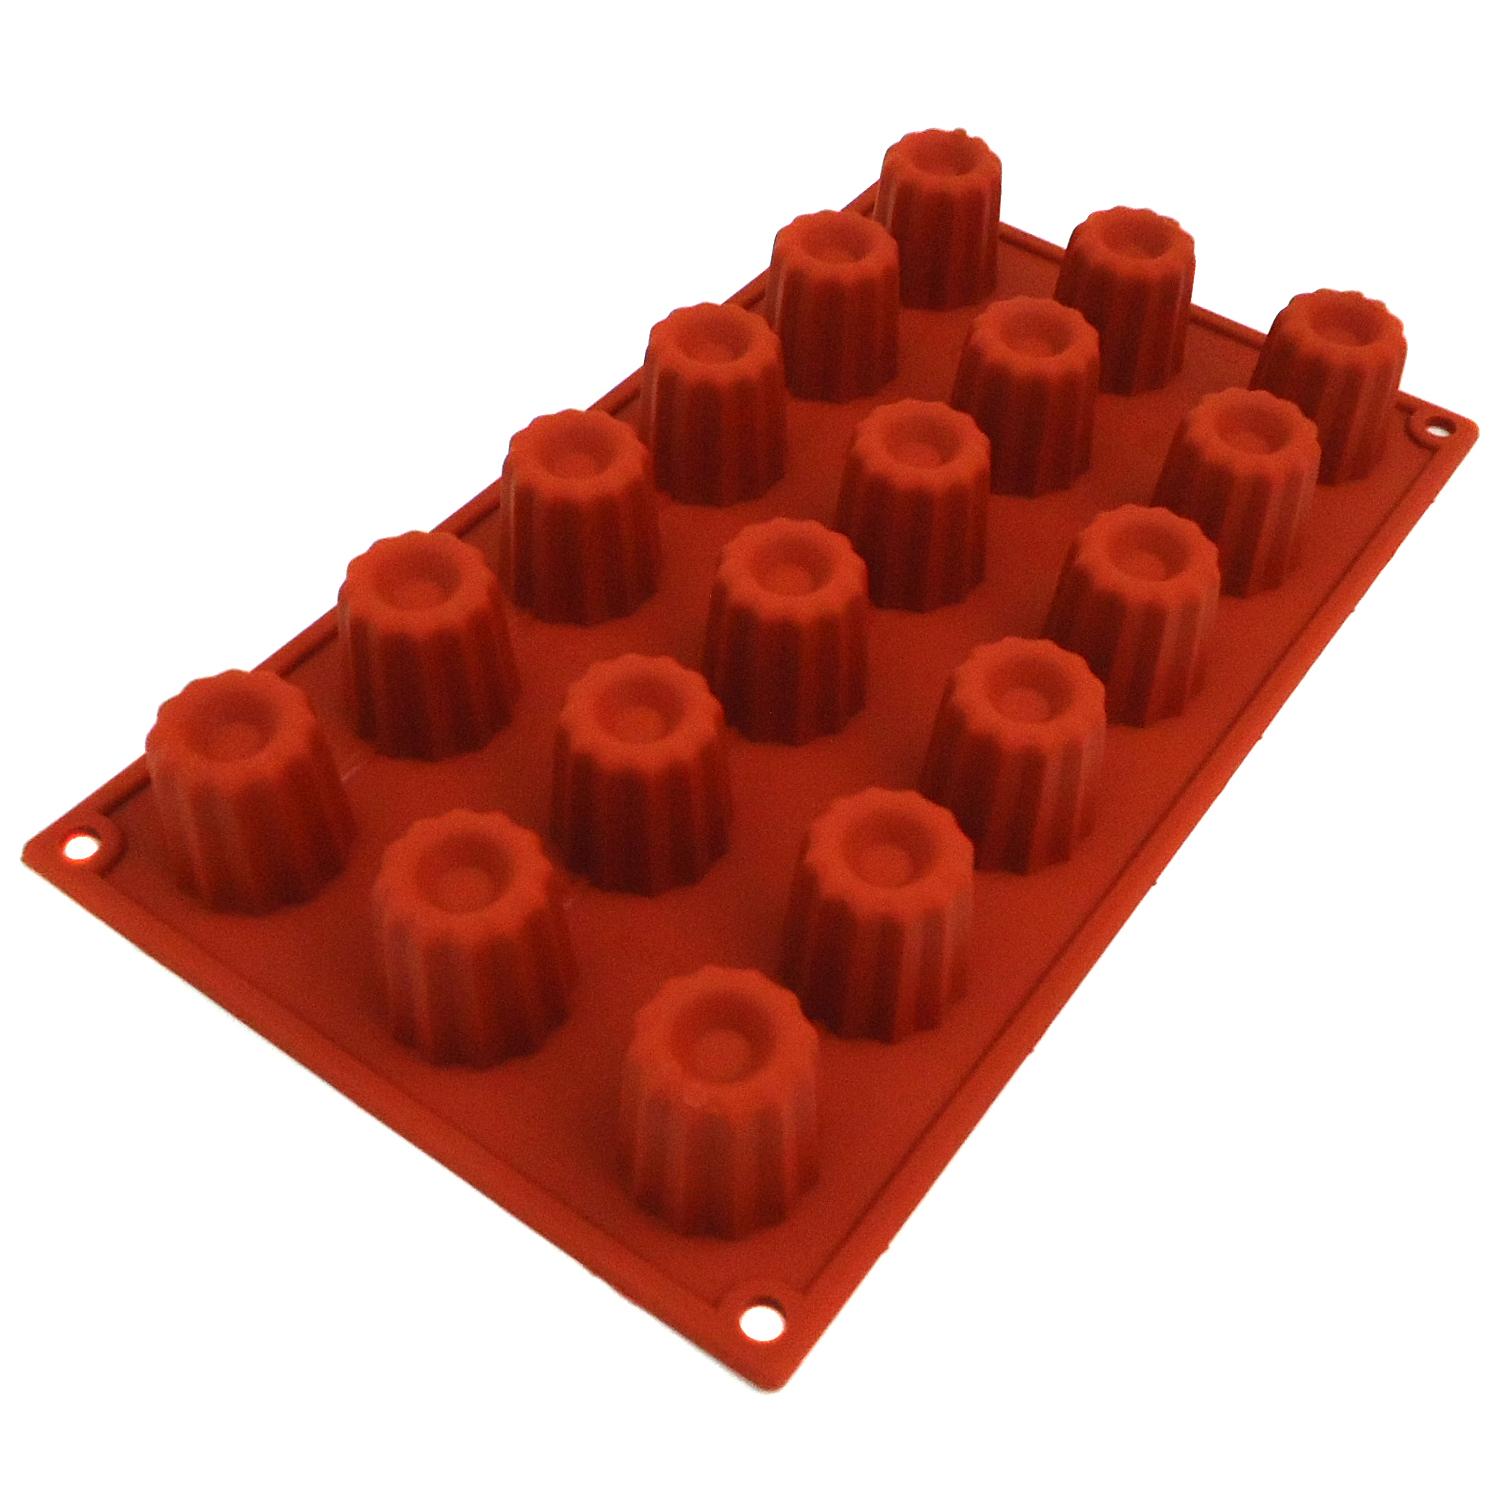 Lacor 66744 Αντικολλητικές Φόρμες Ψησίματος Σιλικόνης Mini Bordelais 18 Θέσεων Ø επαγγελματικός εξοπλισμός   επαγγελματικά σκεύη είδη σερβιρίσματος   εξαρτήματα